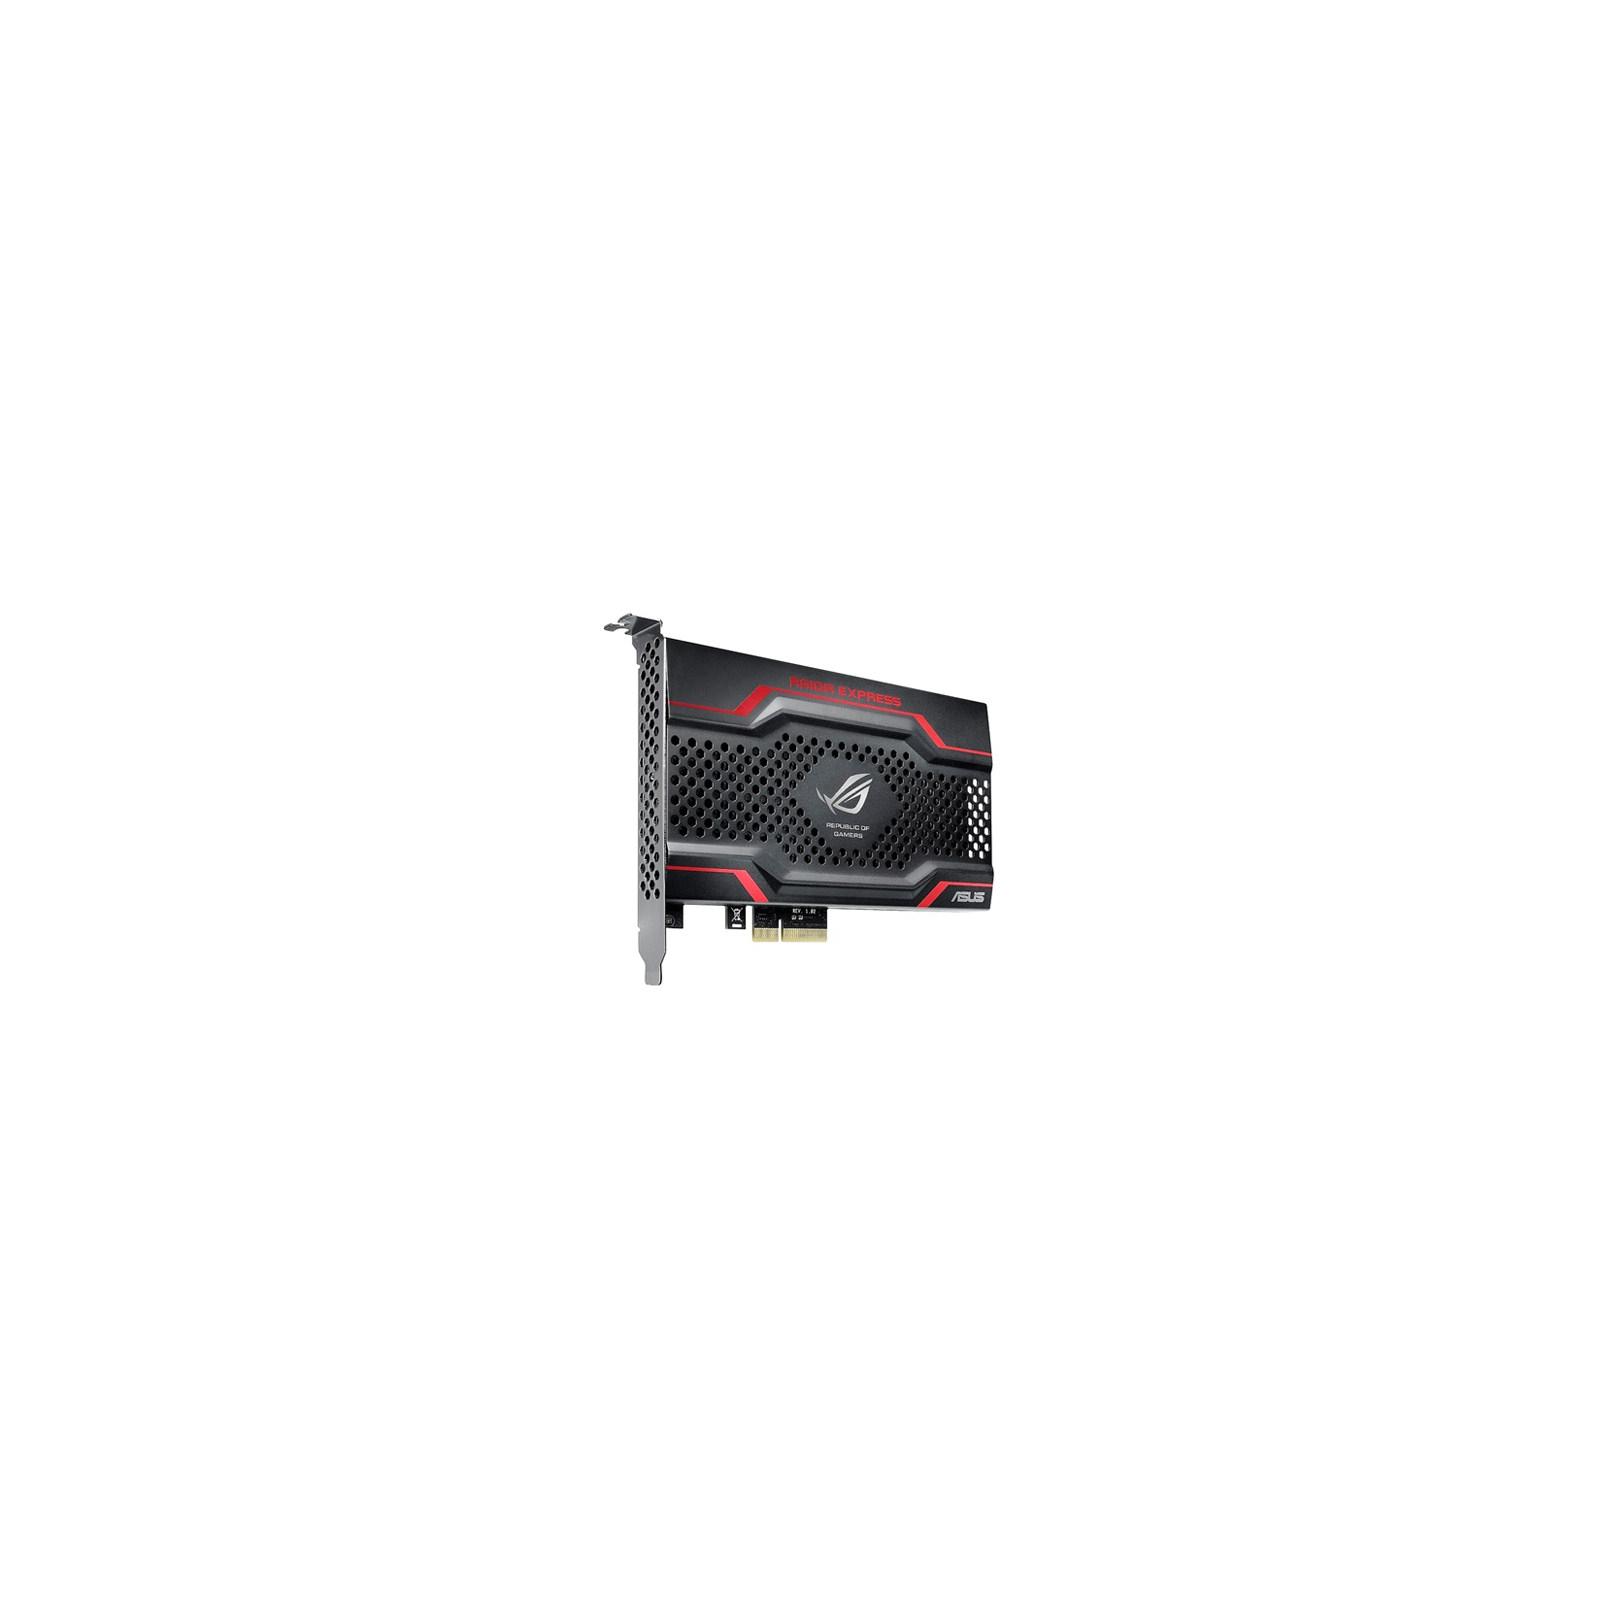 Накопитель SSD PCI-Express 240GB ASUS (RAIDR EXPRESS PX2-240GB)